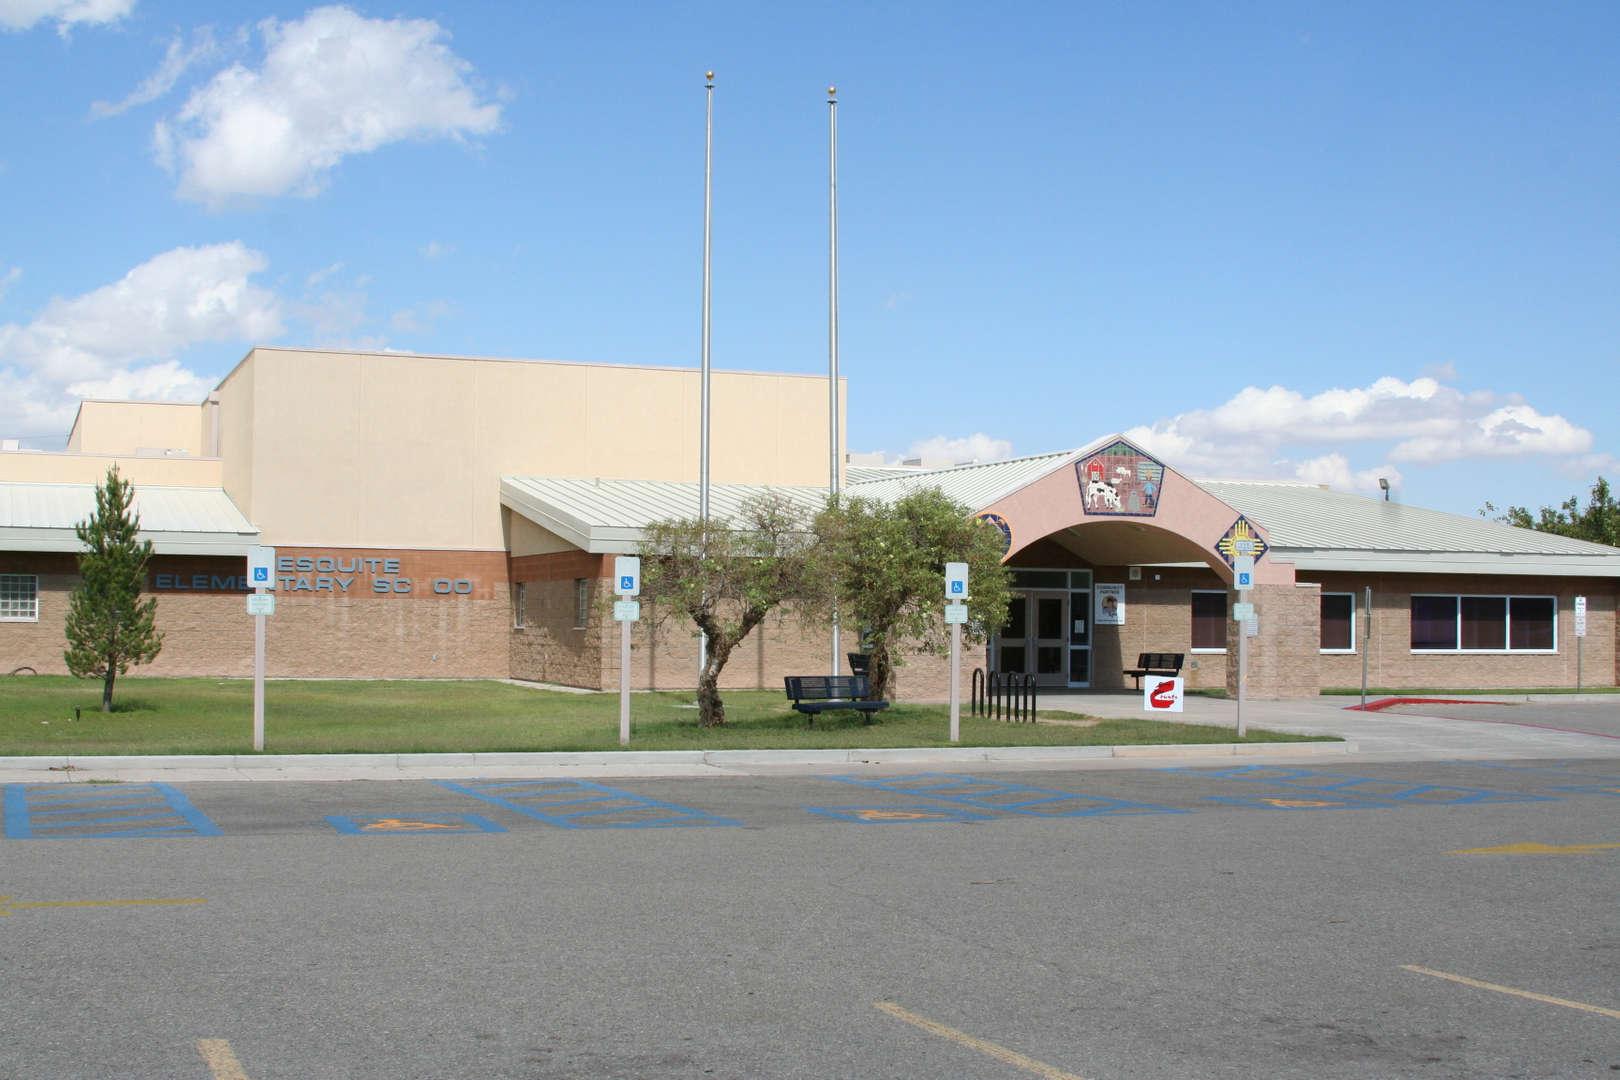 Mesquite Elementary school building